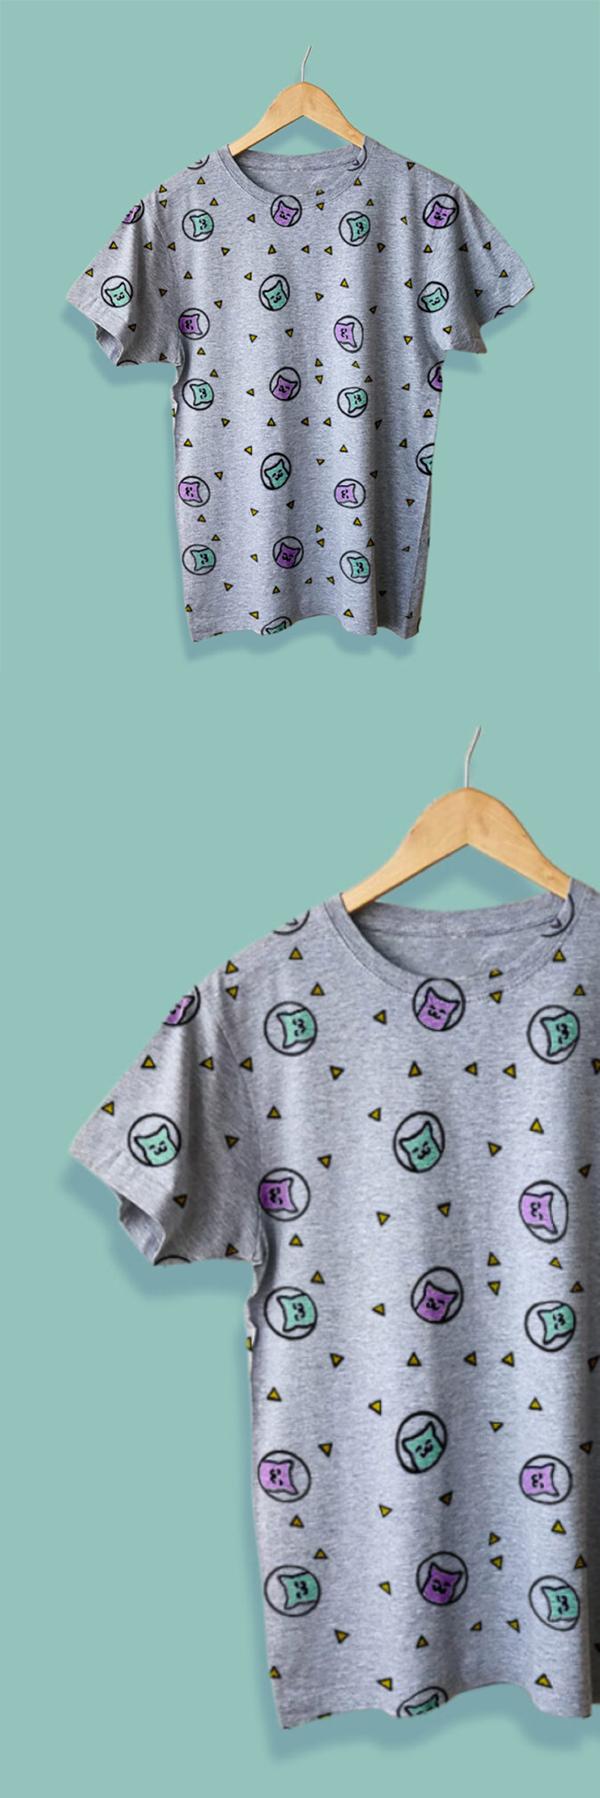 Free Simple Hanging T-Shirt Mockup